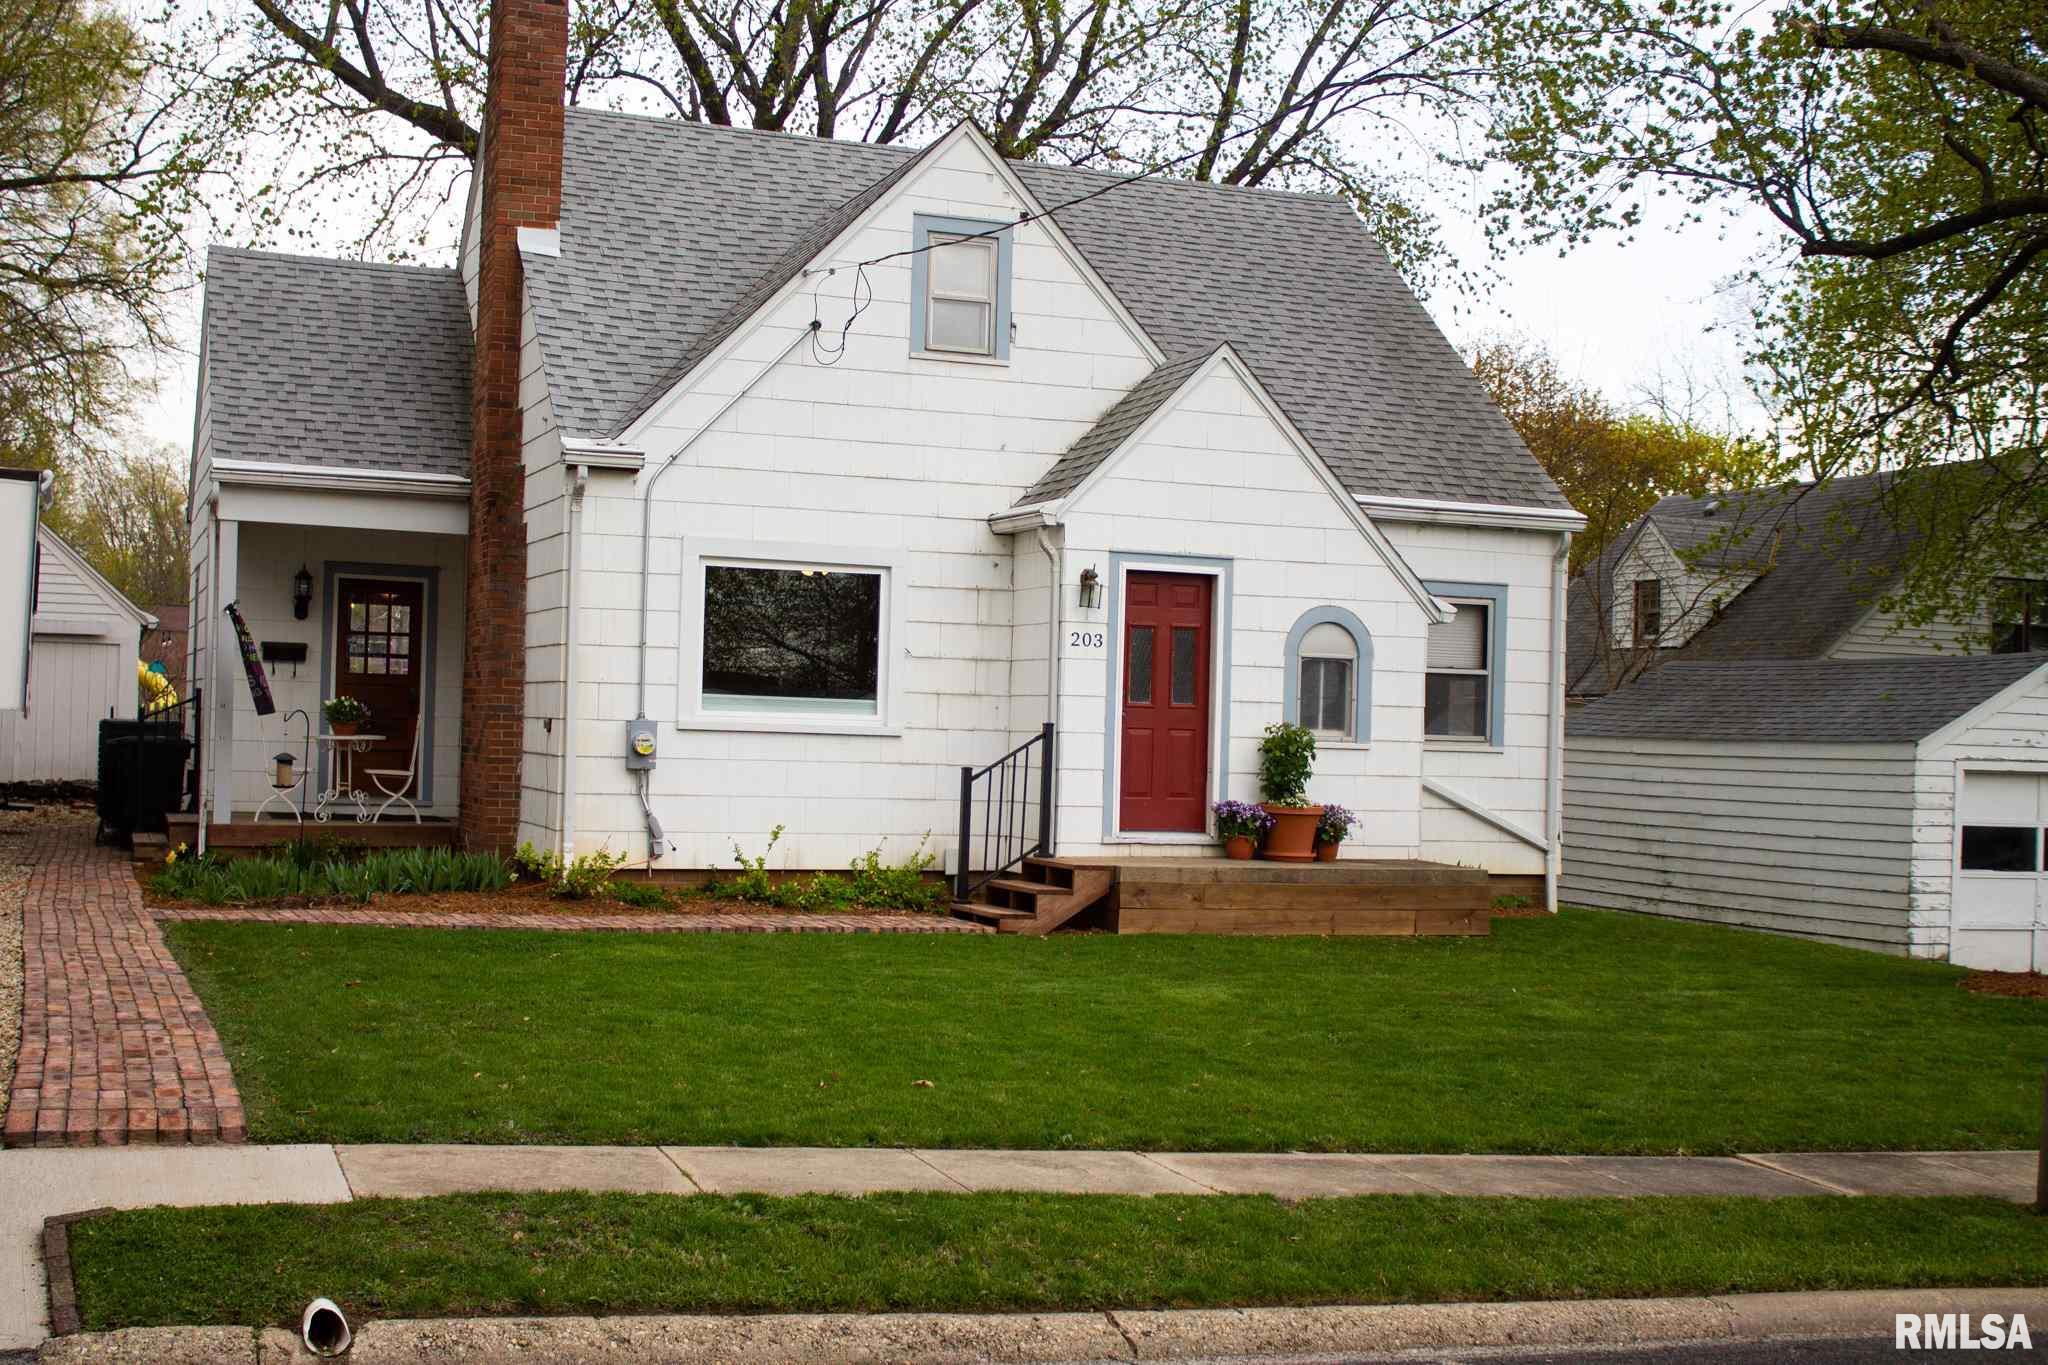 203 S HAMILTON Property Photo - Eureka, IL real estate listing